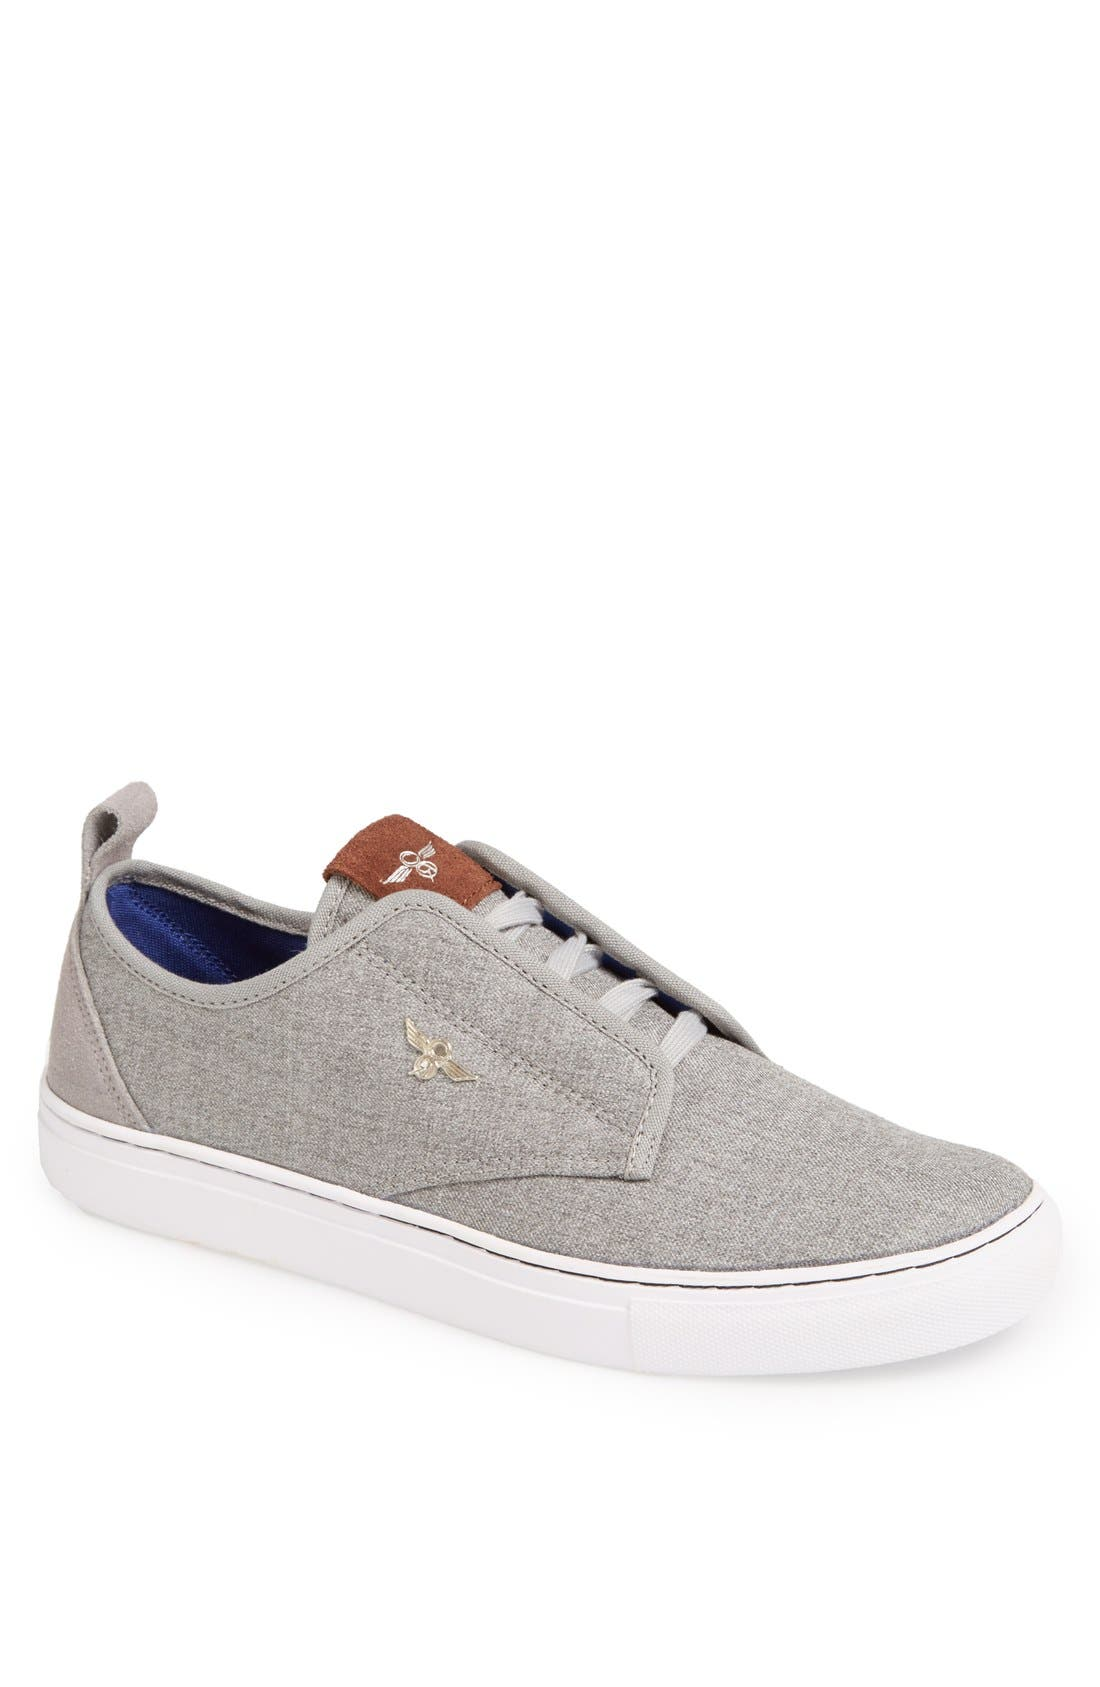 Alternate Image 1 Selected - Creative Recreation 'Lacava' Sneaker (Men)